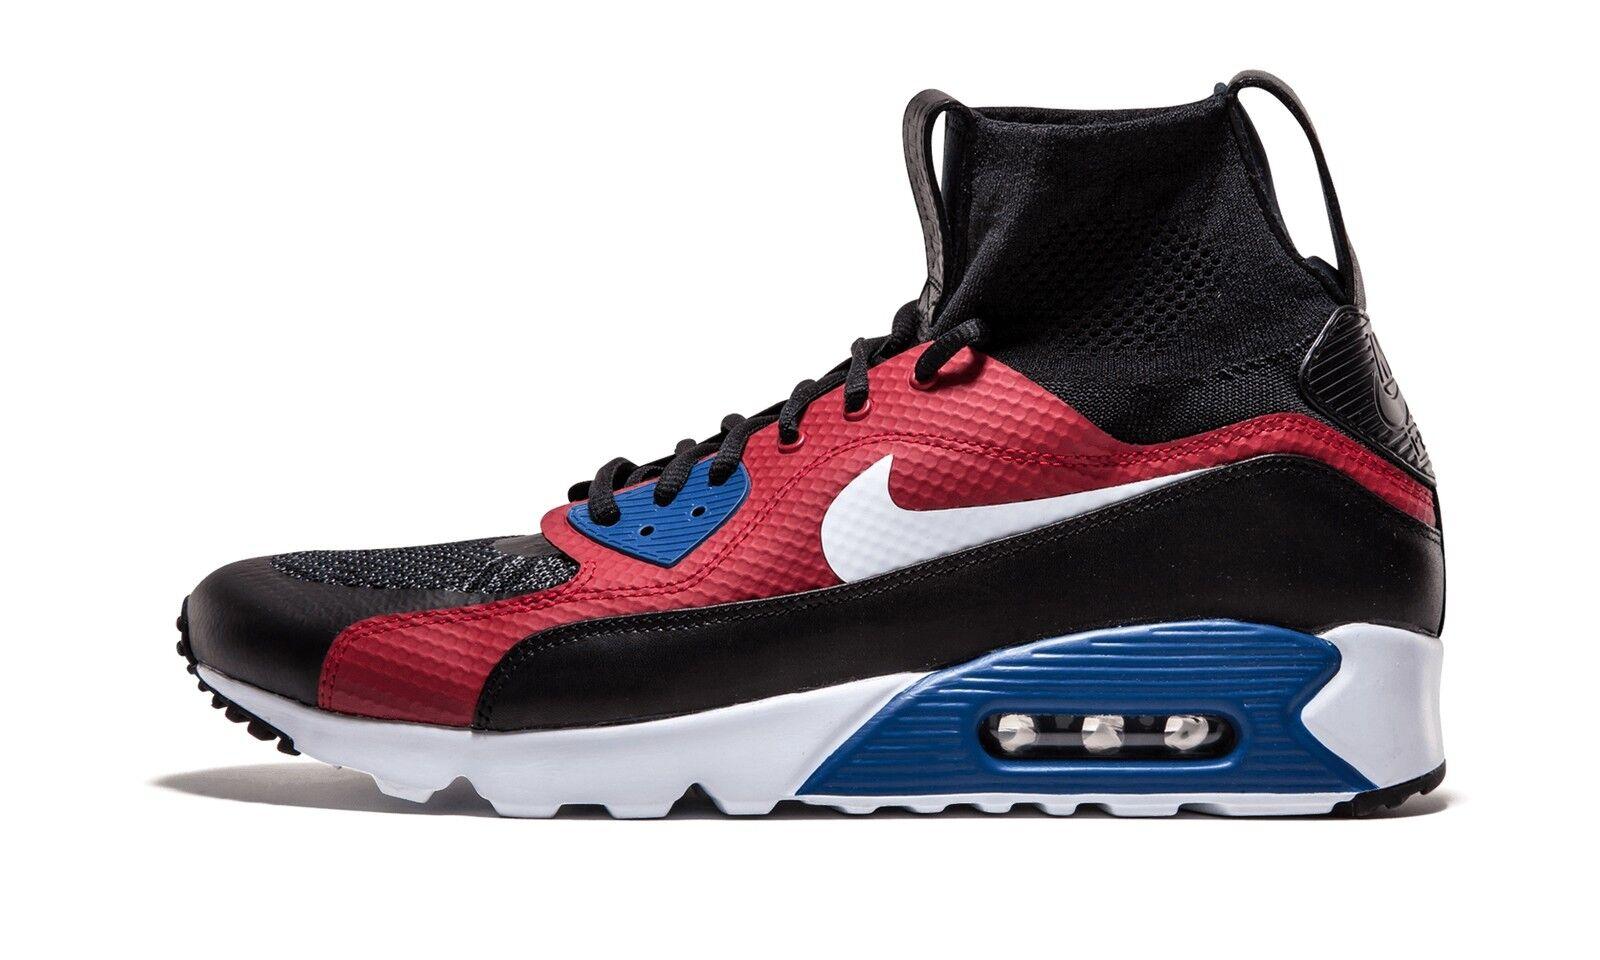 Nike Air Max 90 Ultra Superfly - 850613 001